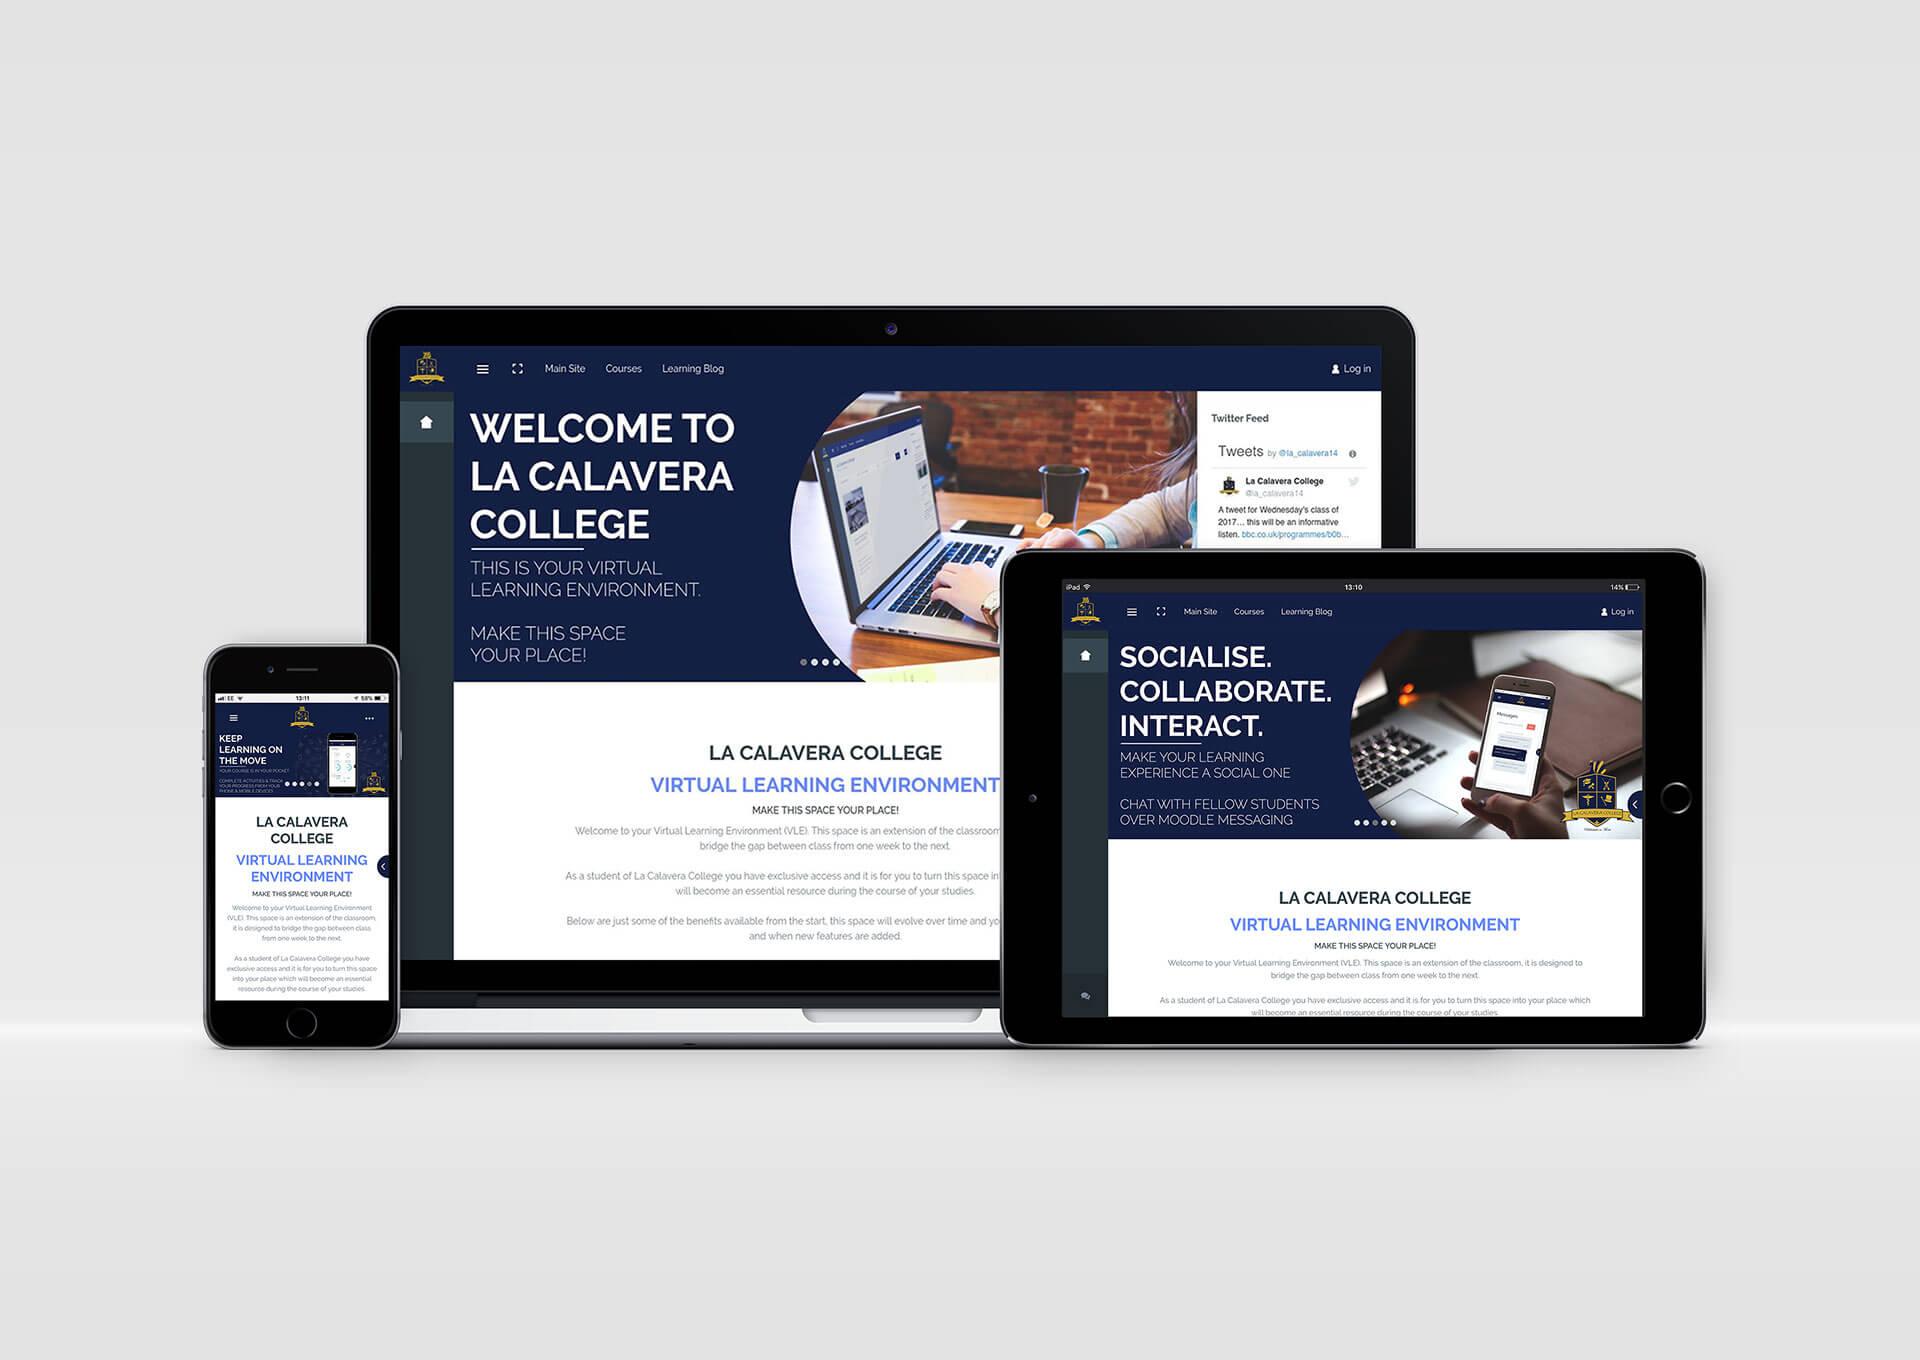 La Calavera College LMS Website